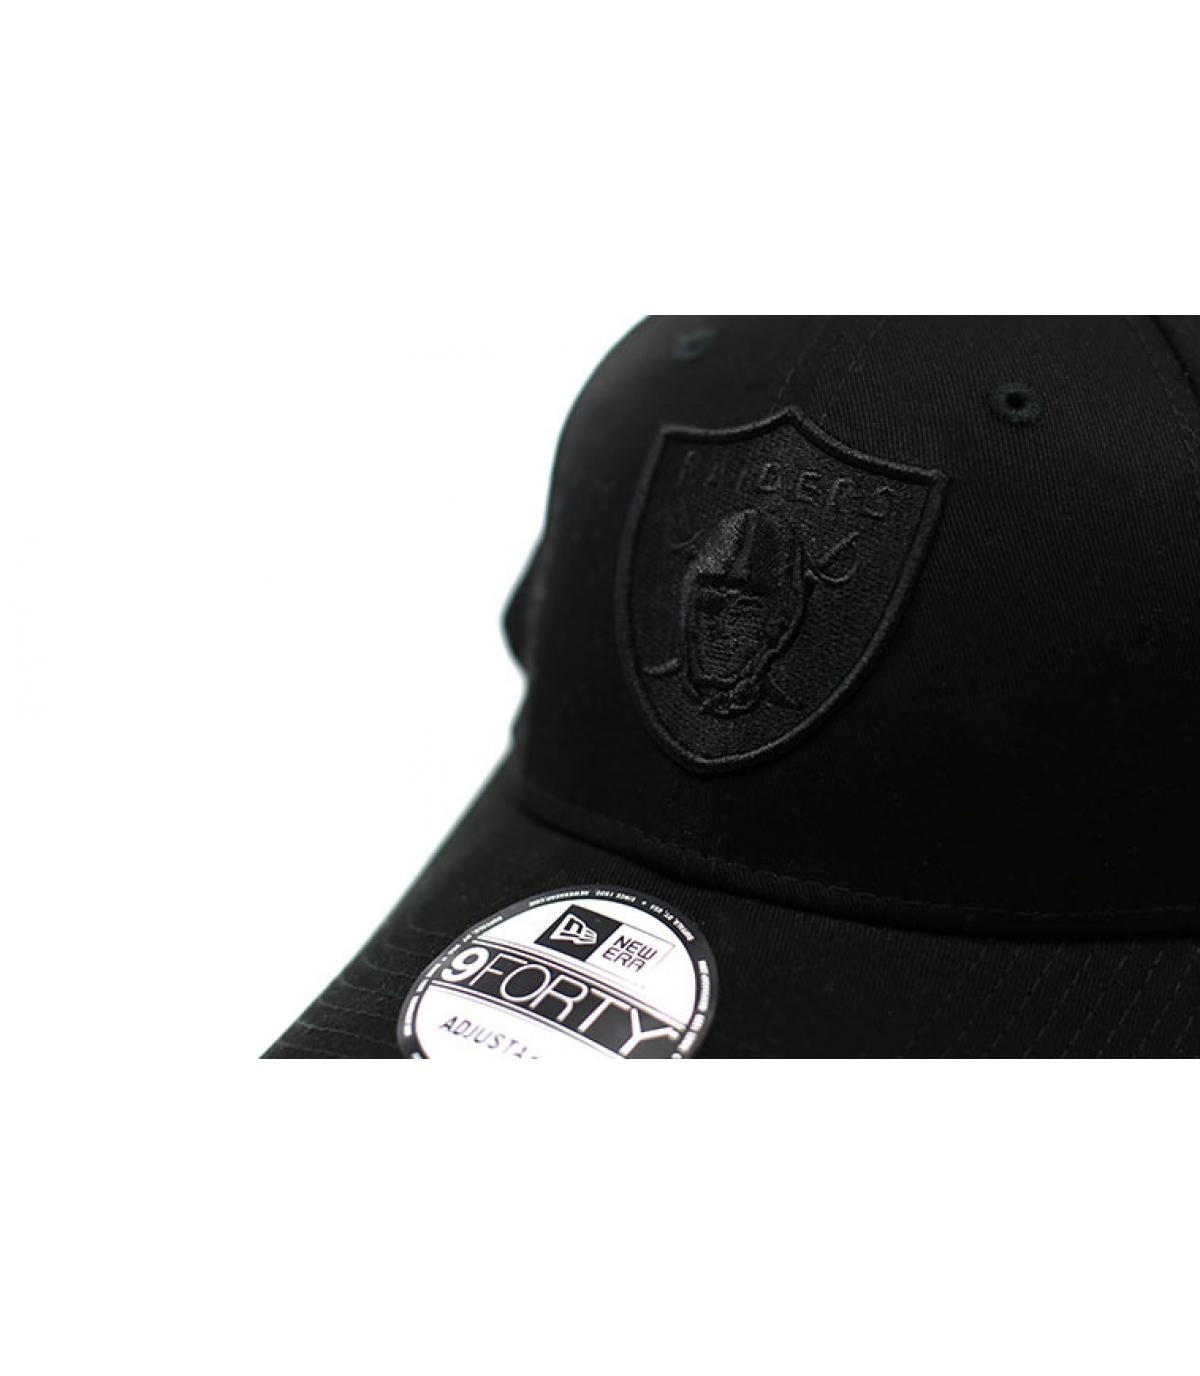 Details Cap 9Forty Raiders Snapback black - Abbildung 3